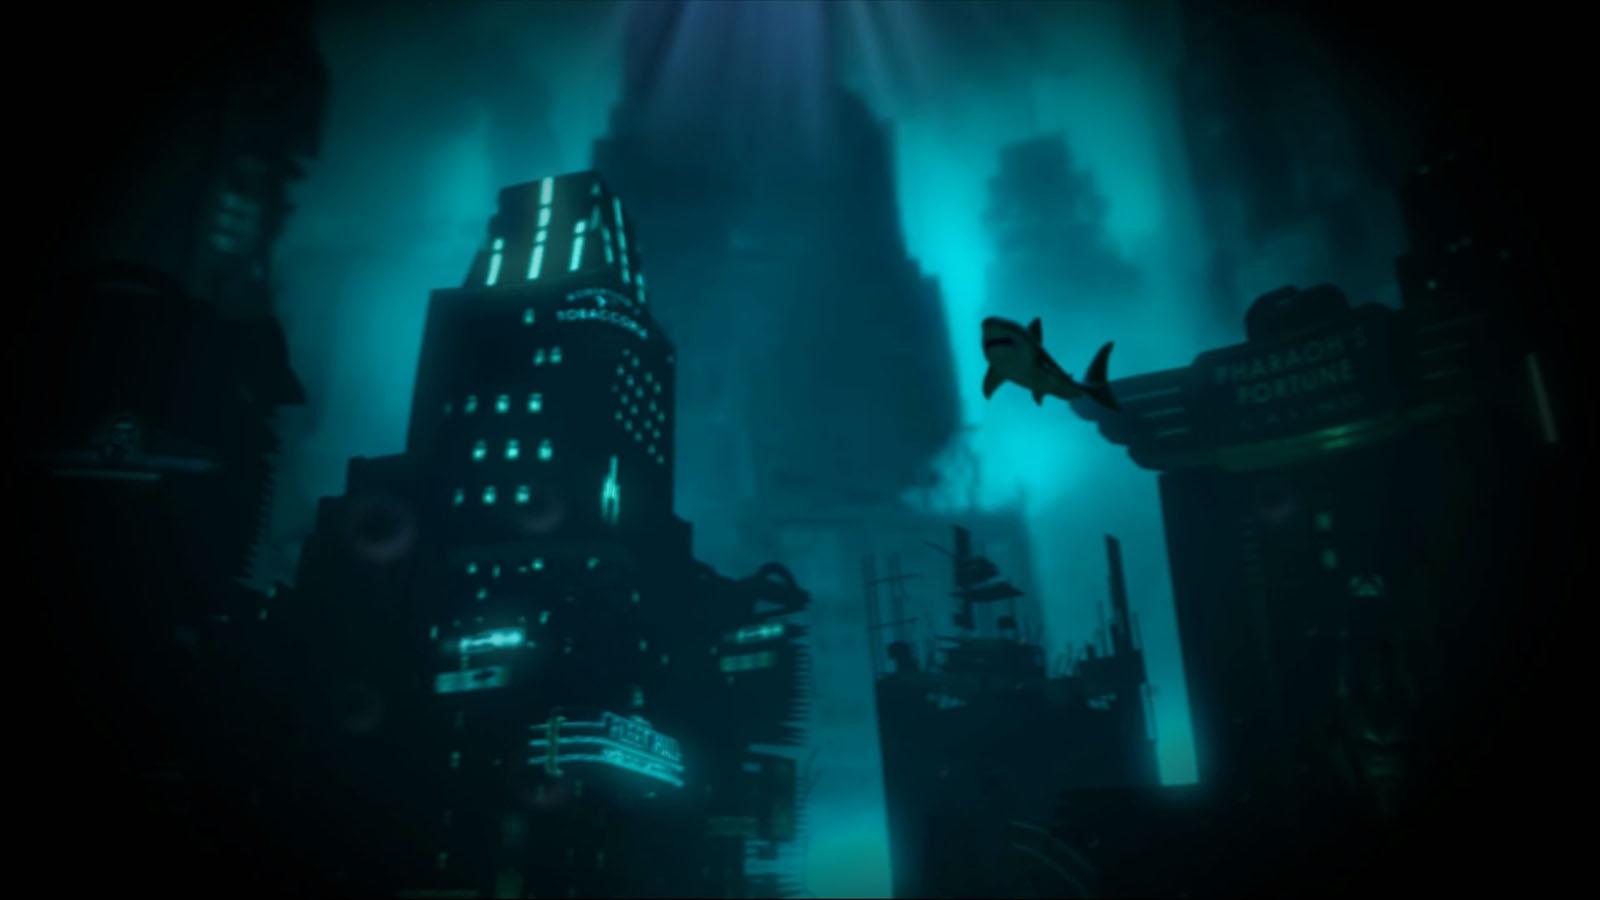 Rapture_-_Undersea_City.jpg